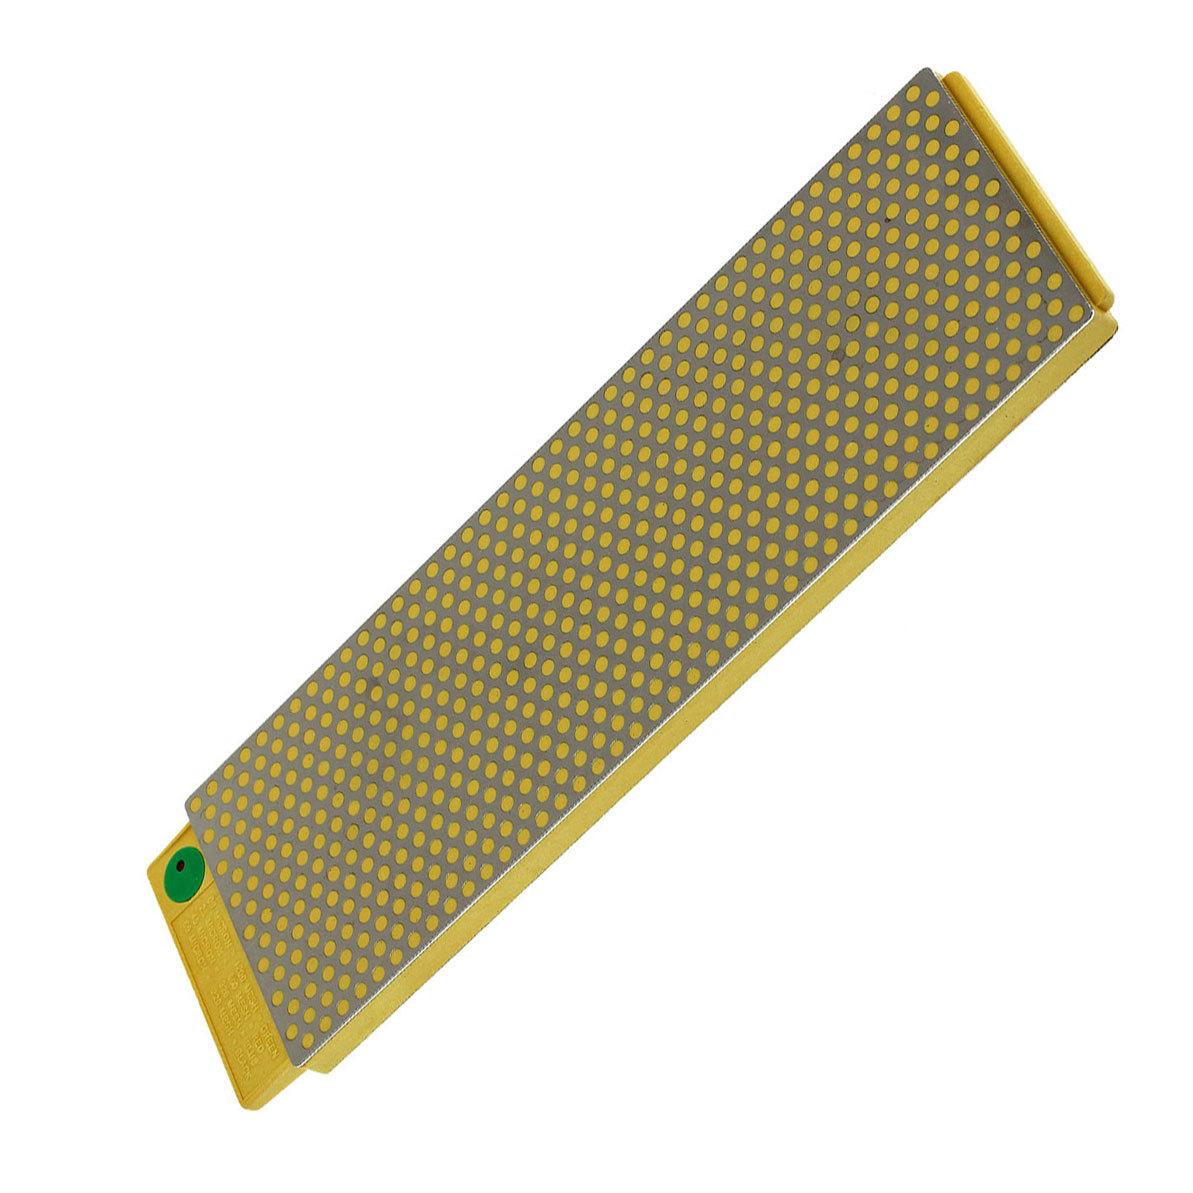 Брусок точильный алмазный двусторонний DMT Extra Fine / Fine, 1200 меш, 9 мкм / 600 меш, 25 мкм от DMT® Diamond Machining Technology